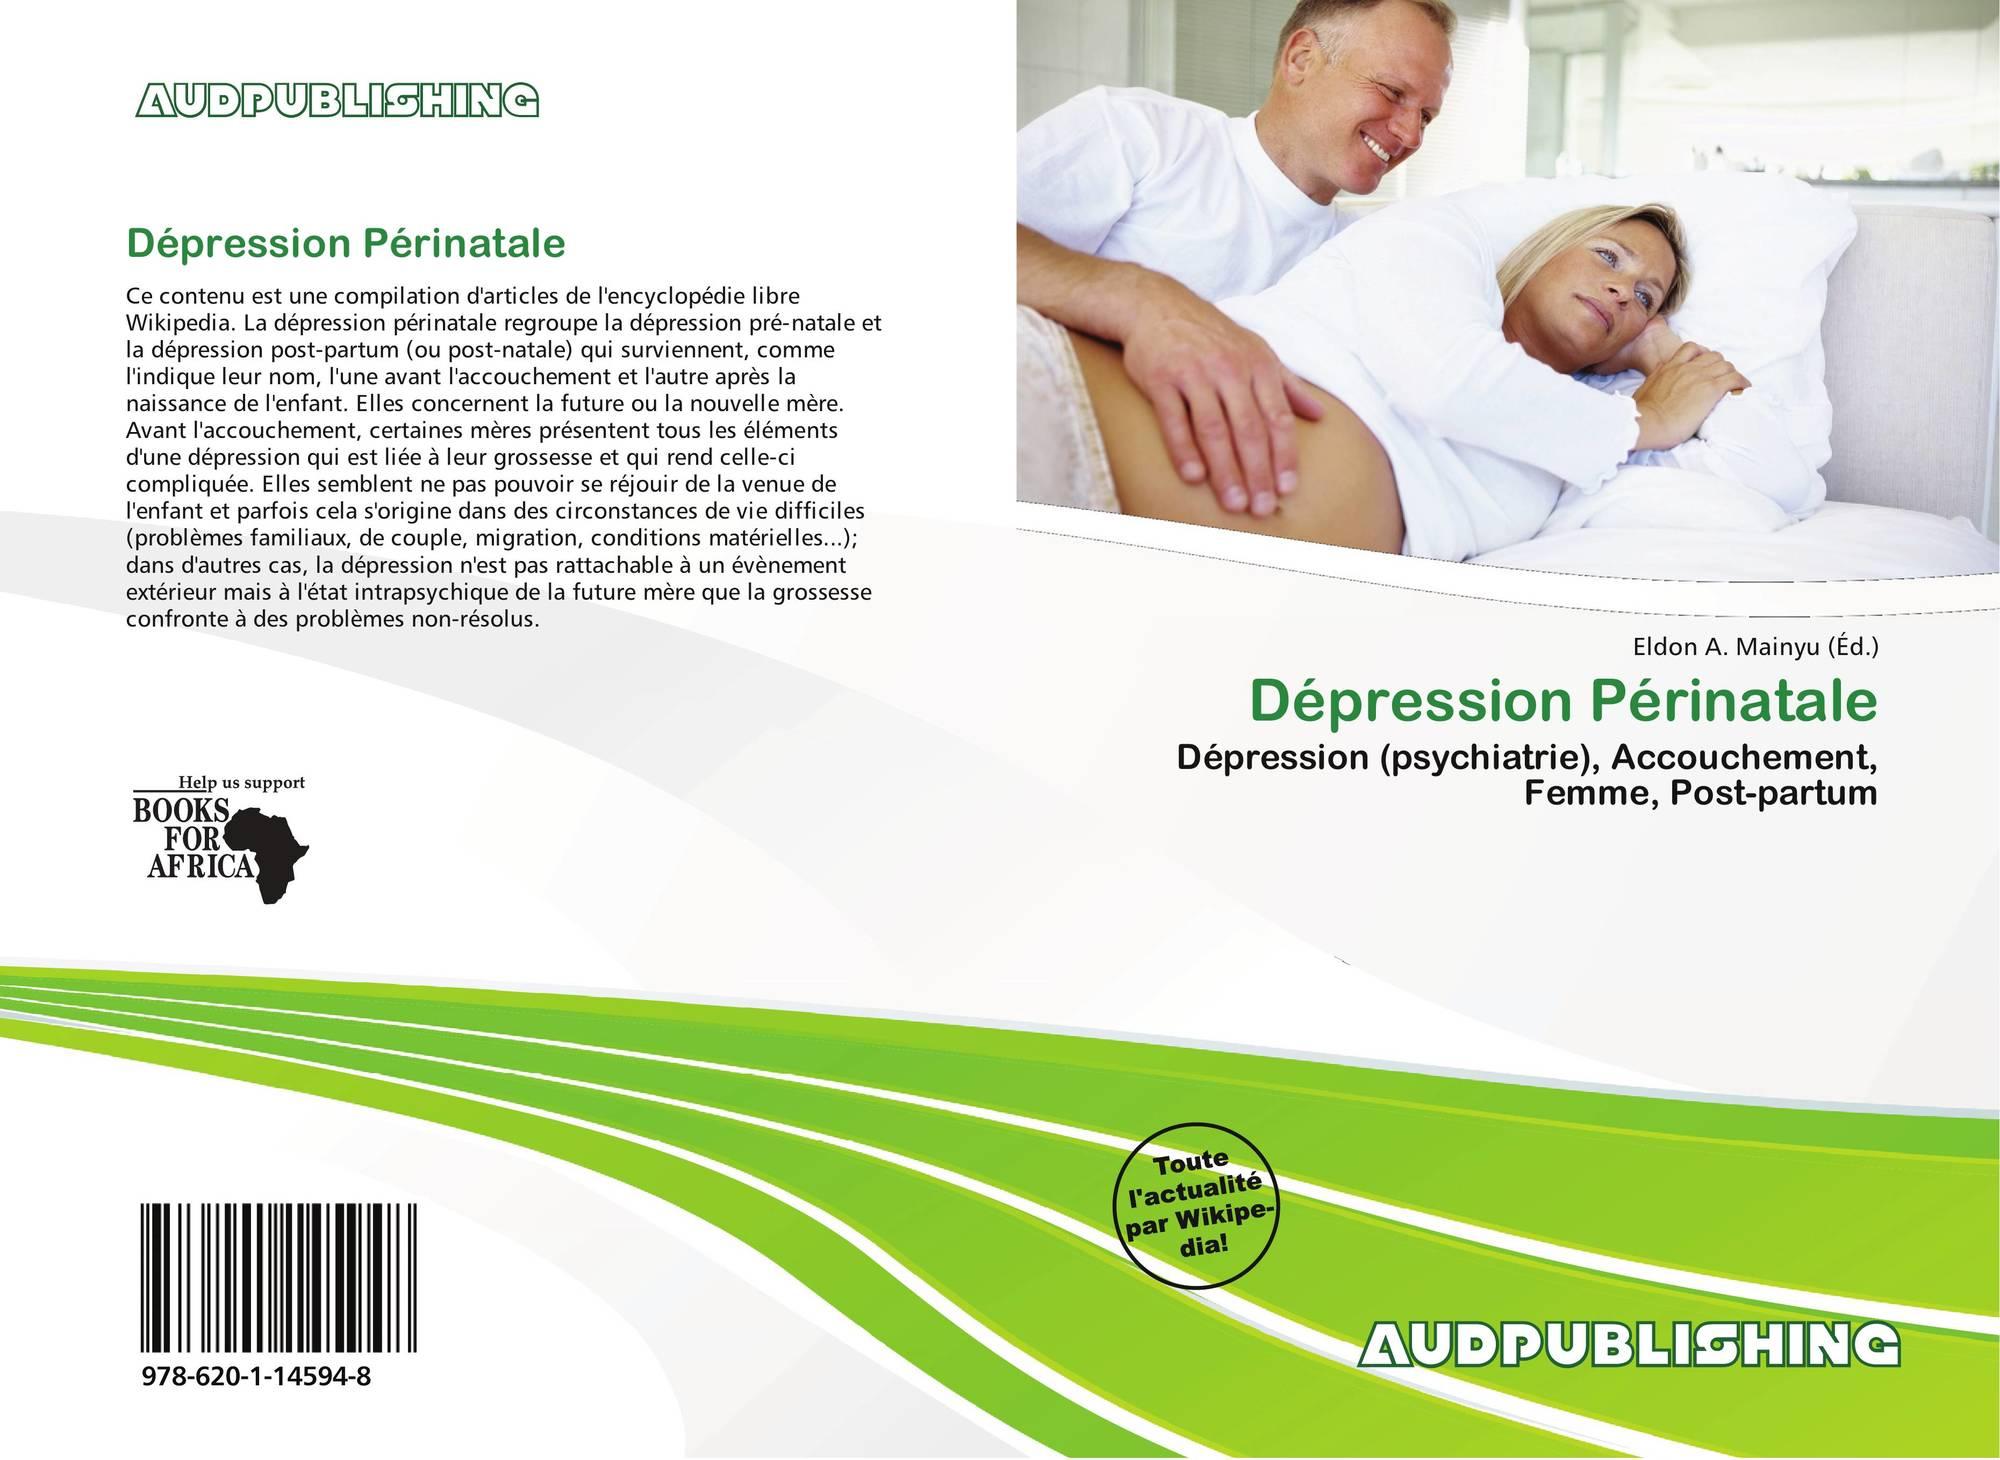 d pression p rinatale 978 620 1 14594 8 620114594x 9786201145948. Black Bedroom Furniture Sets. Home Design Ideas